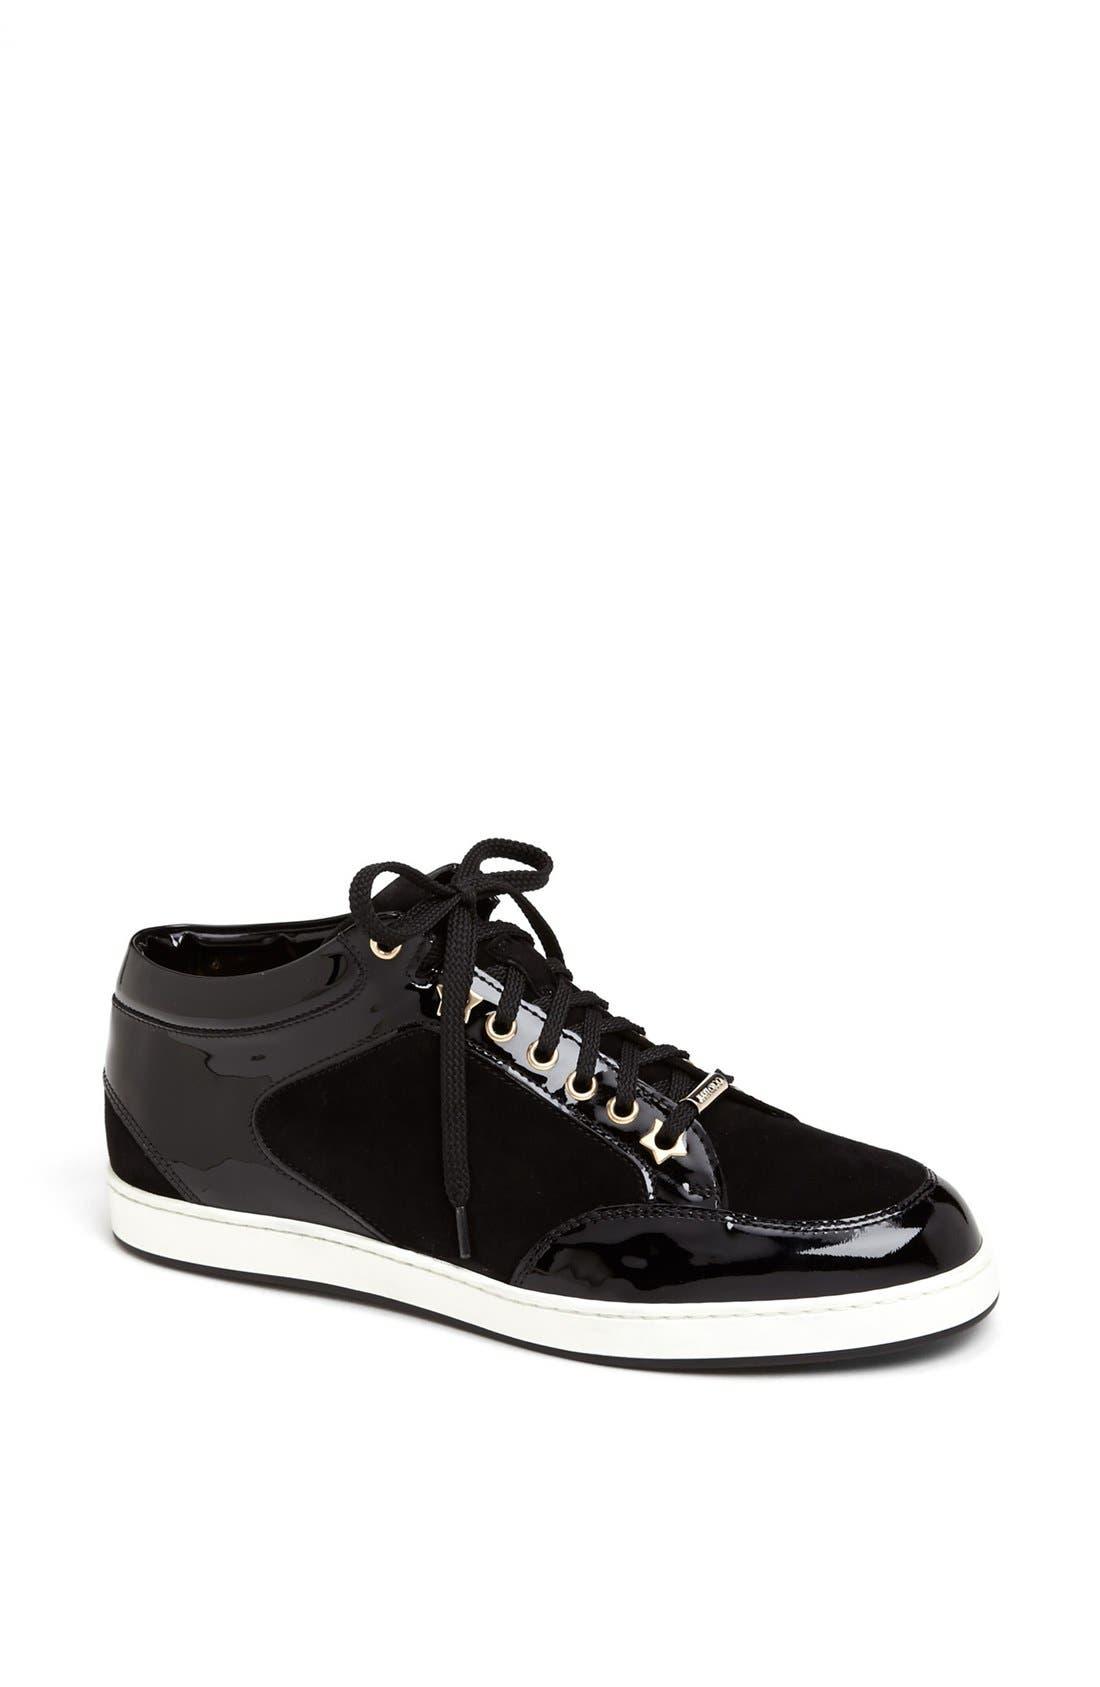 Alternate Image 1 Selected - Jimmy Choo 'Miami' Sneaker